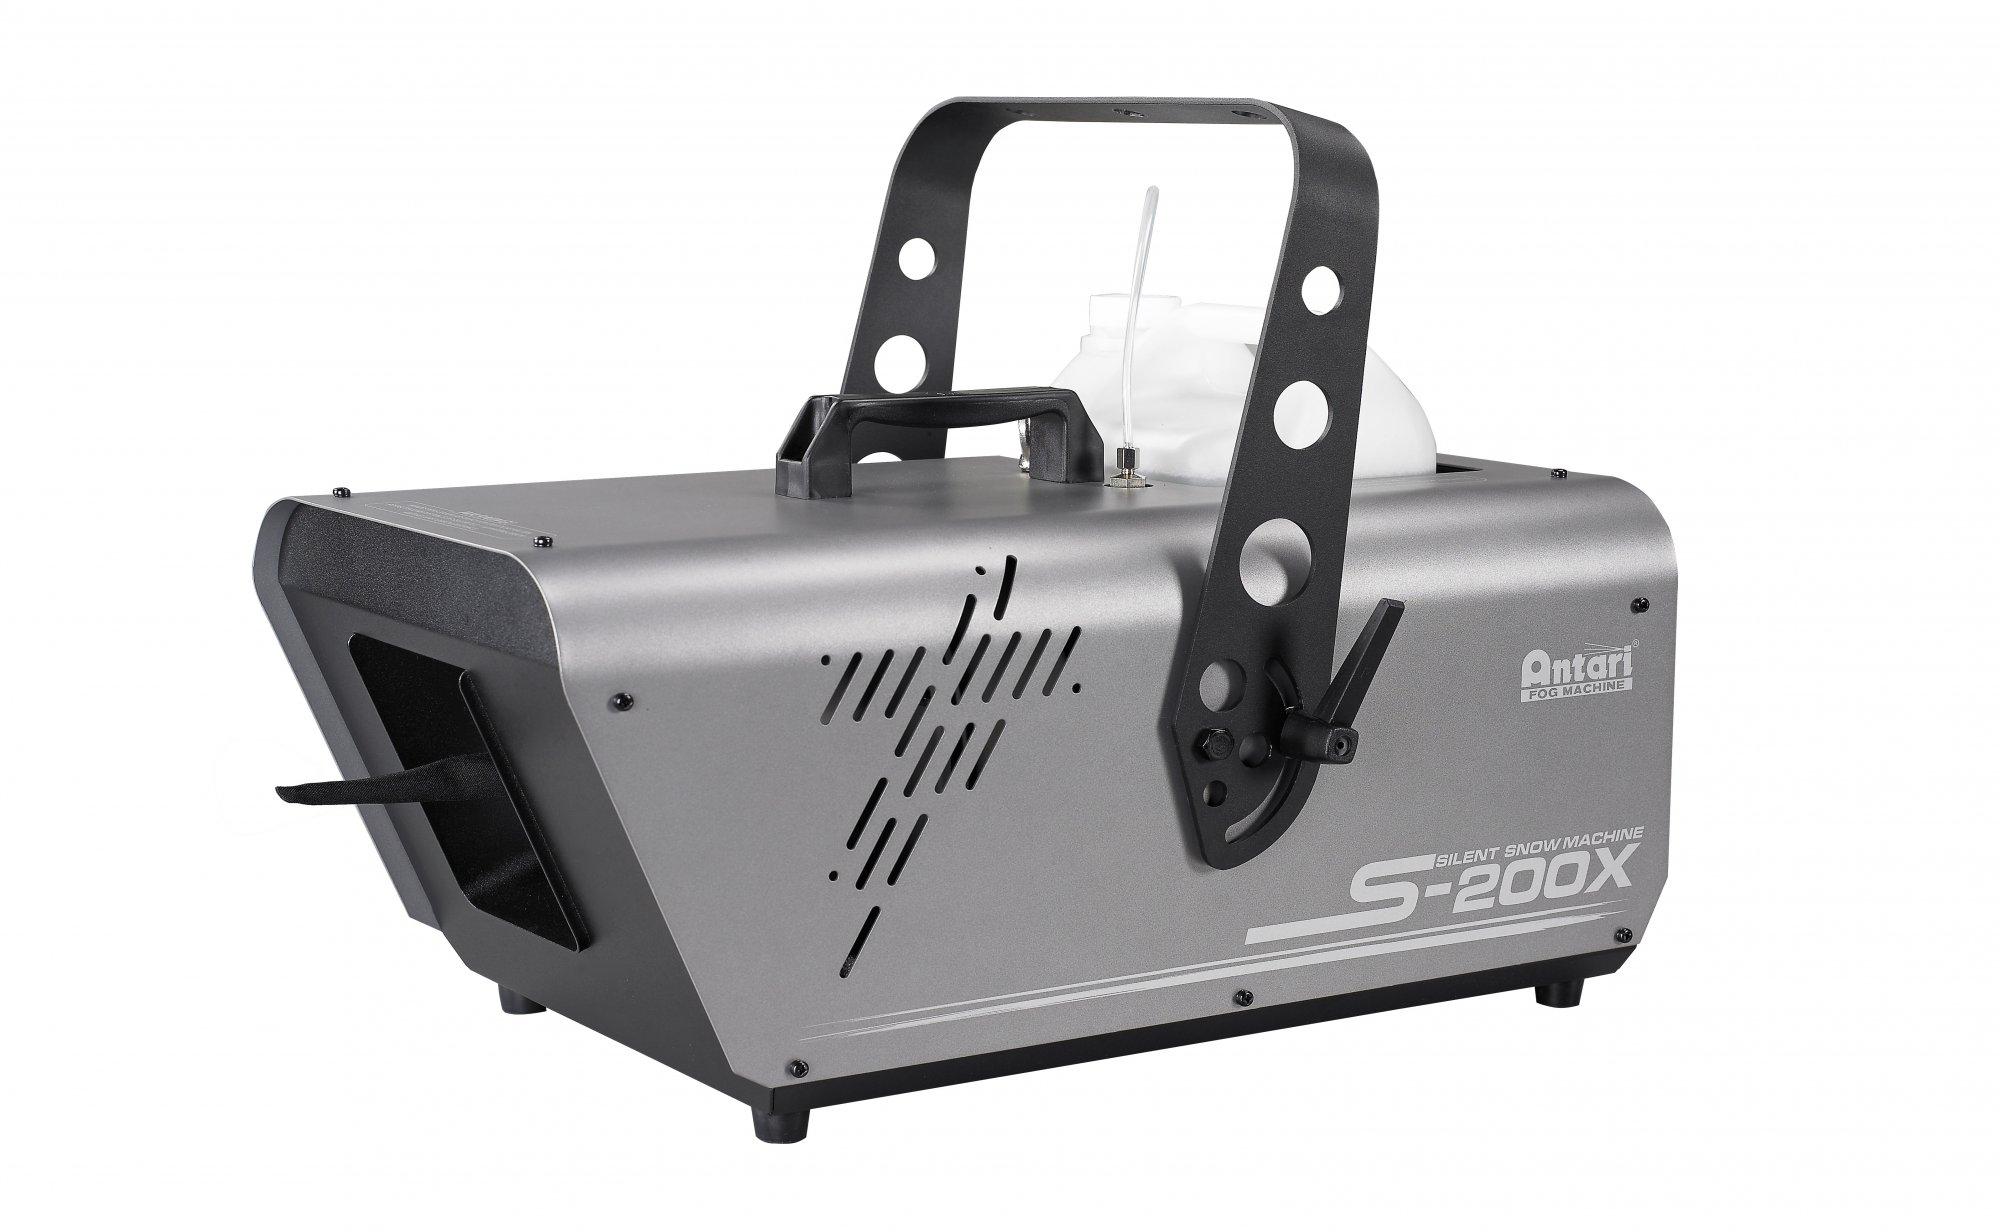 Antari S200X Snow Machine - High Output, Silent Motor